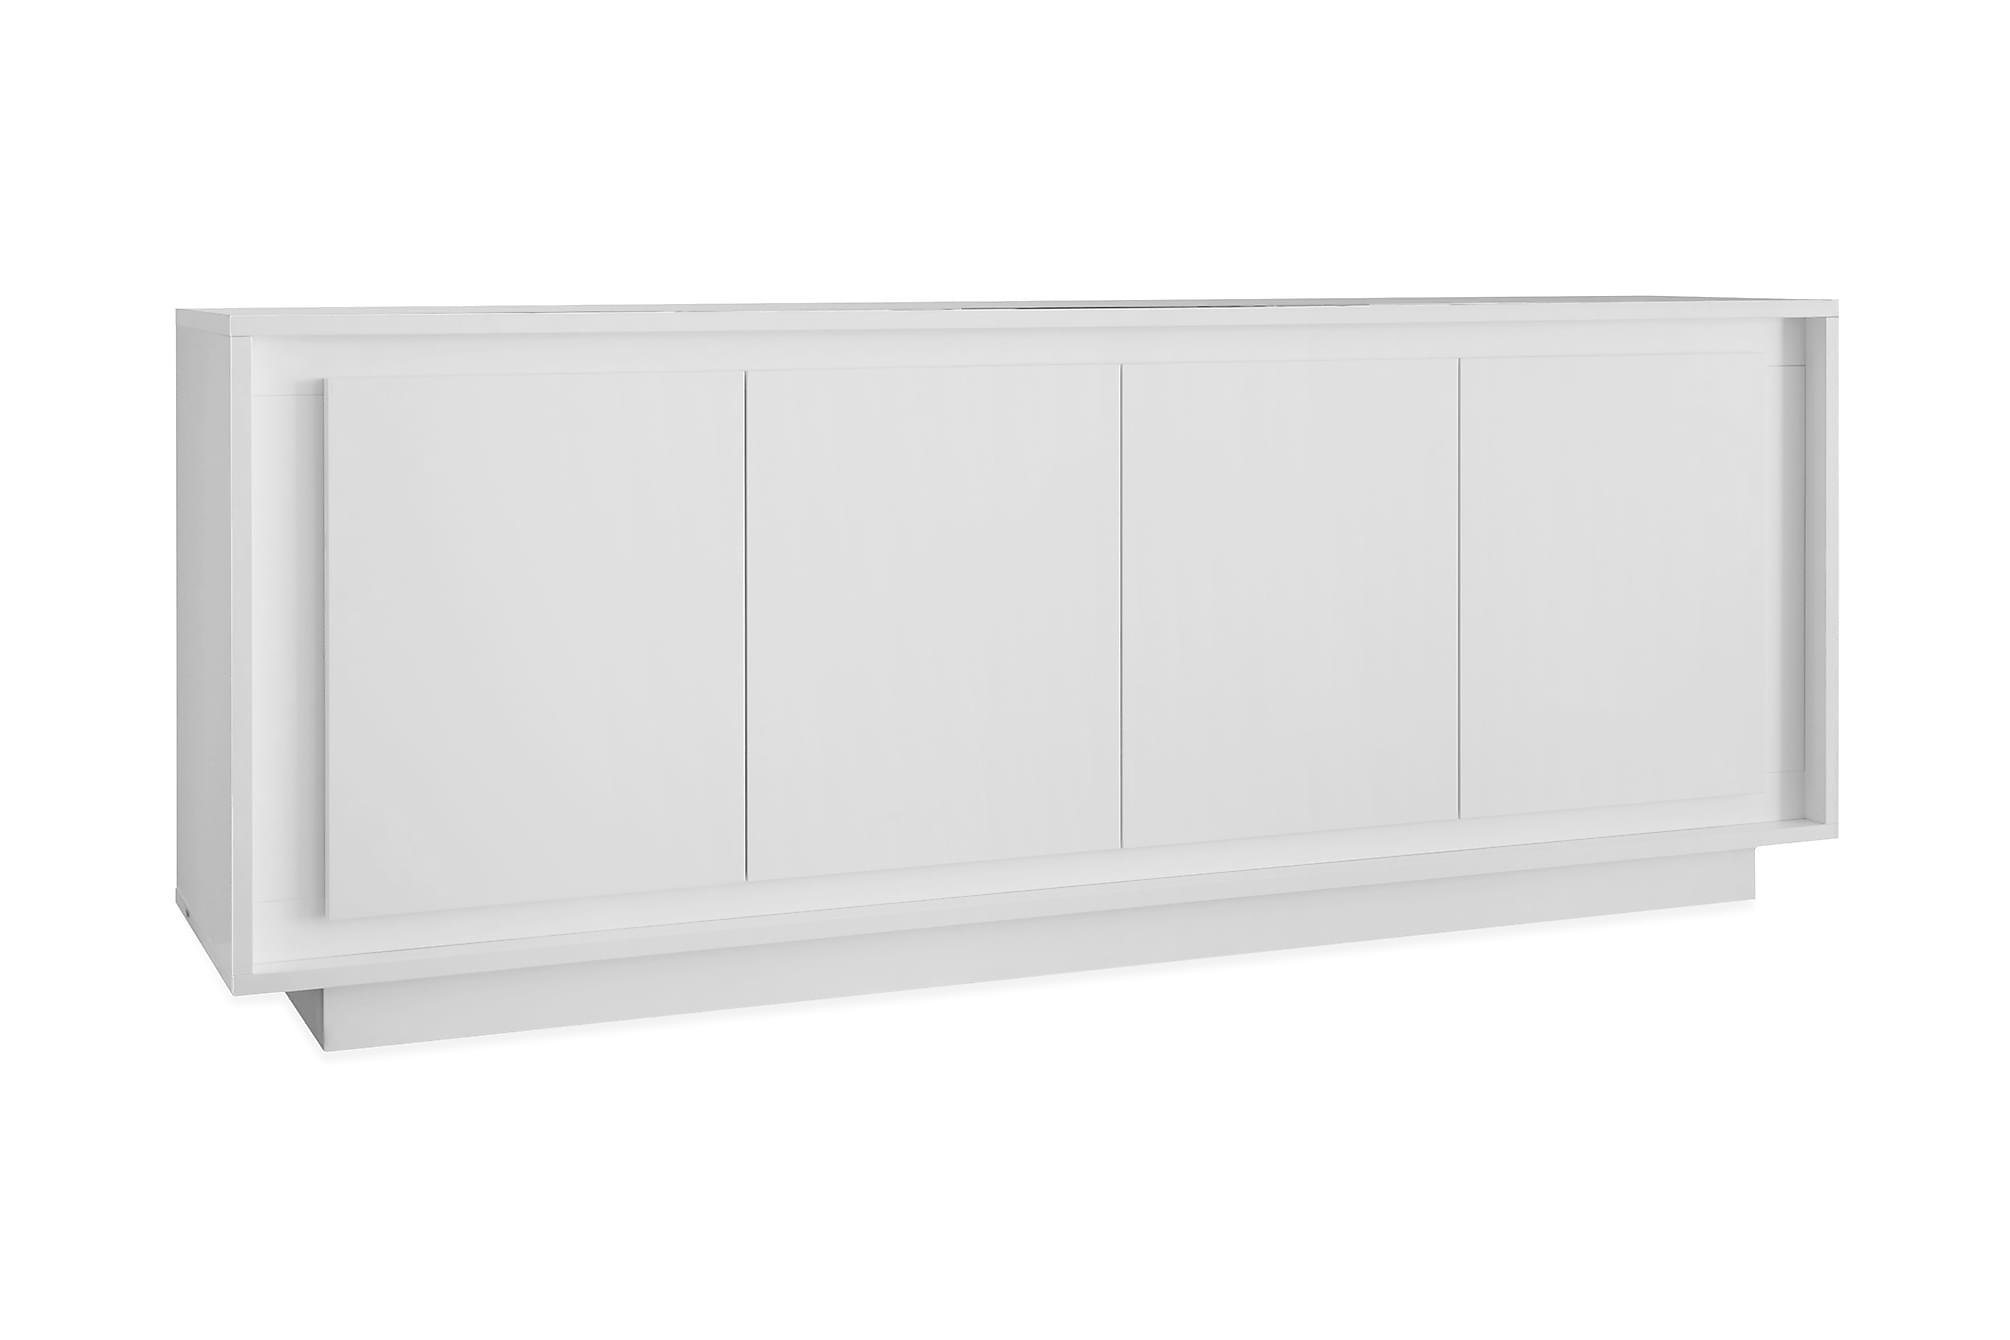 AIMILIO Sideboard 4 Dörrar Mattlack, Sideboards